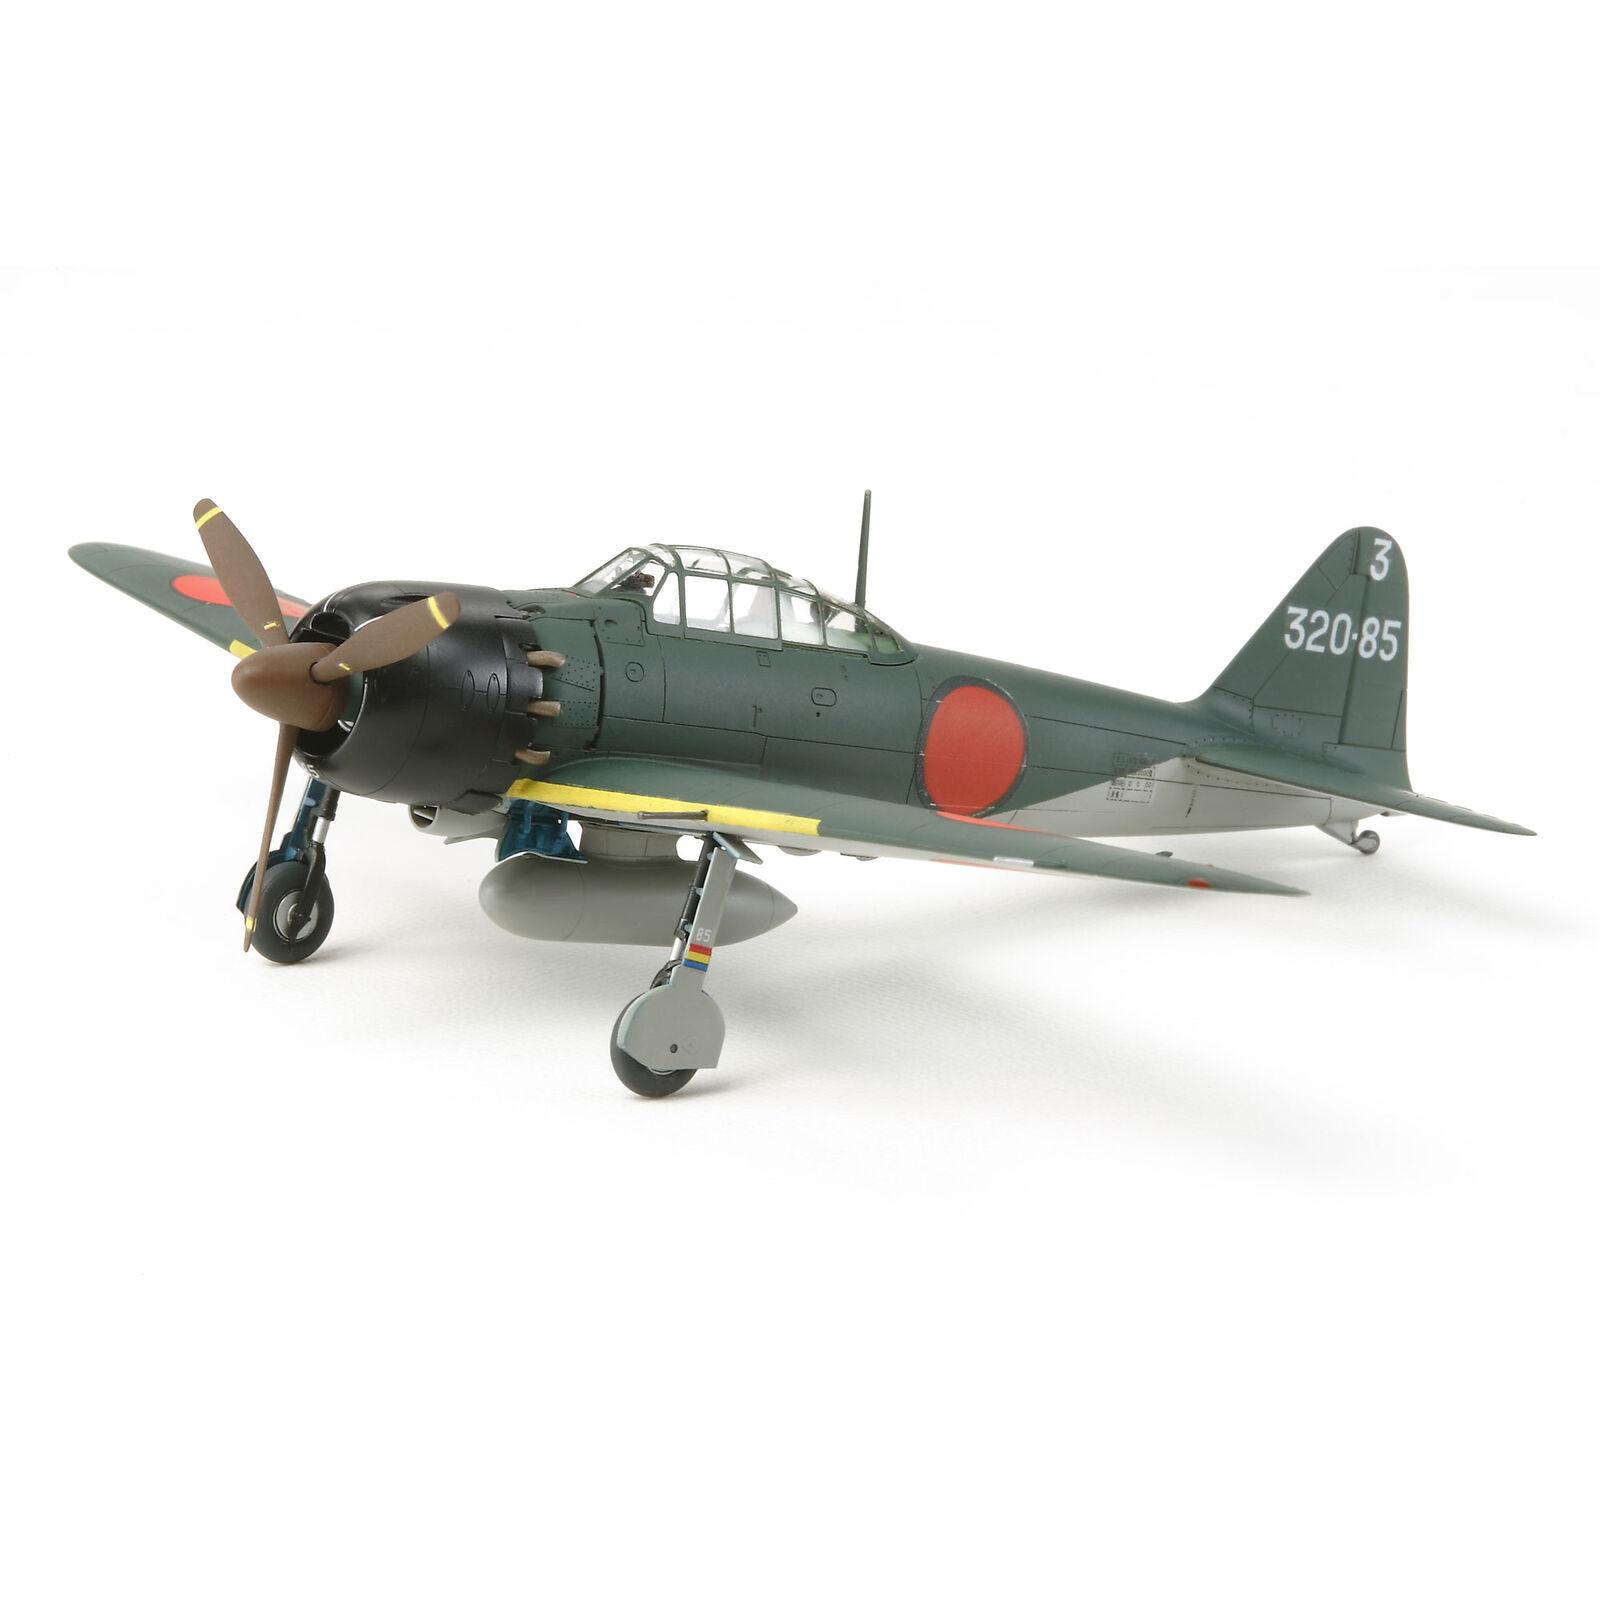 1/72 Mitsubishi A6M5 Zero Fighter (Zeke)